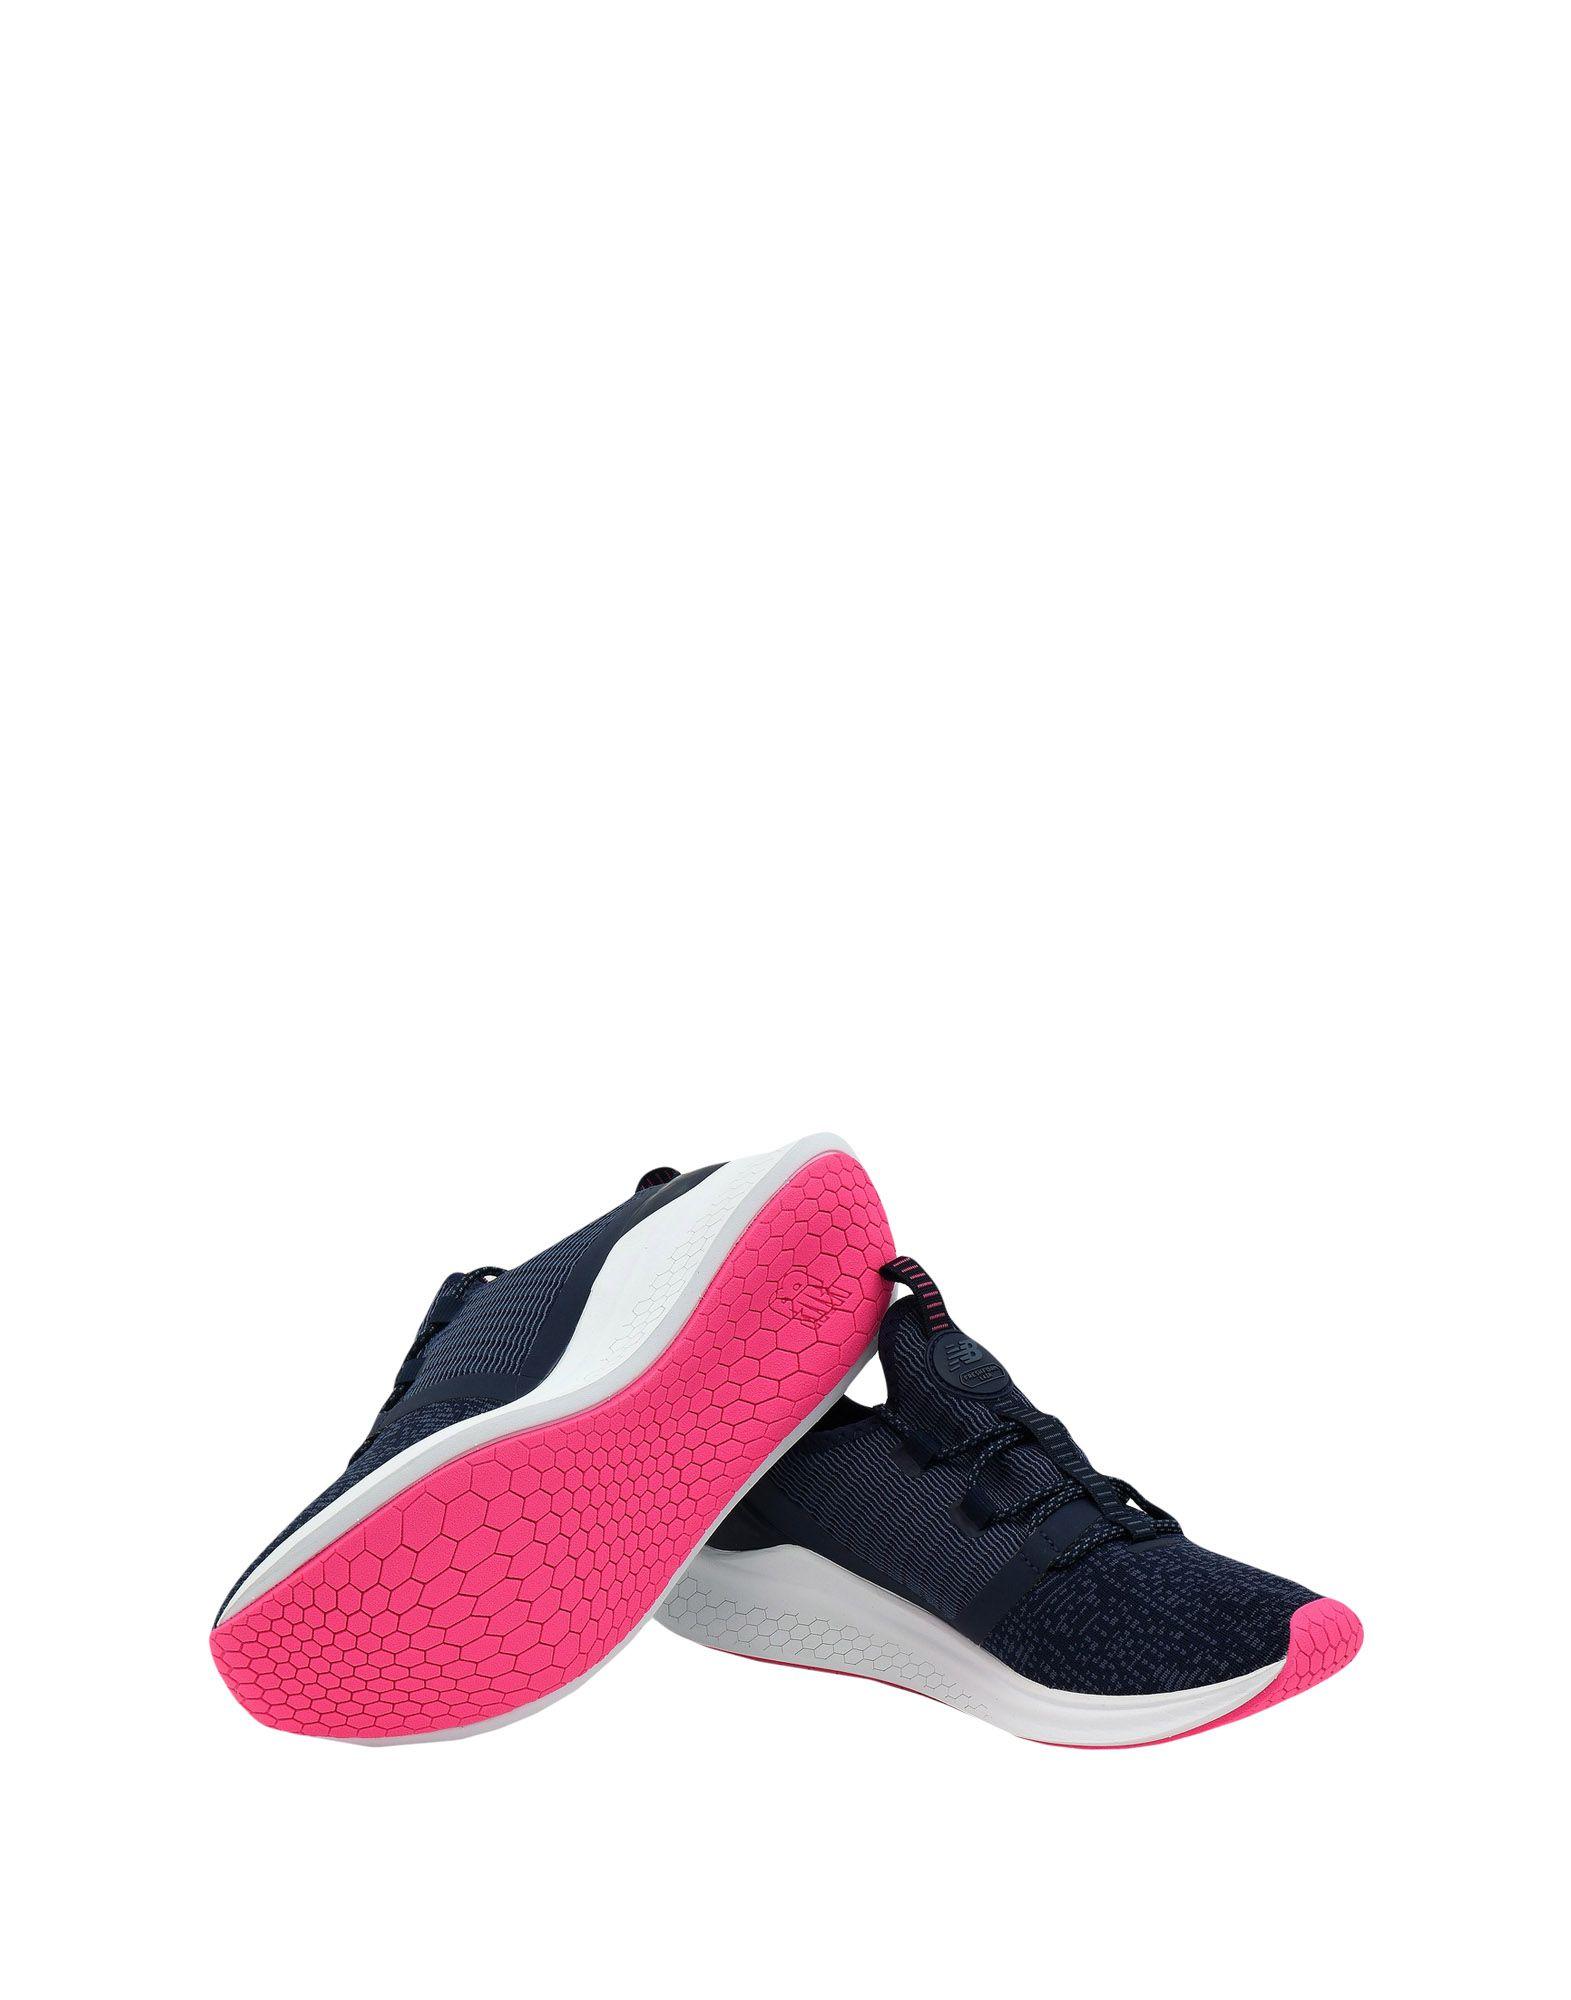 Sneakers New Balance Fresh Foam Lazr Sport - Femme - Sneakers New Balance sur